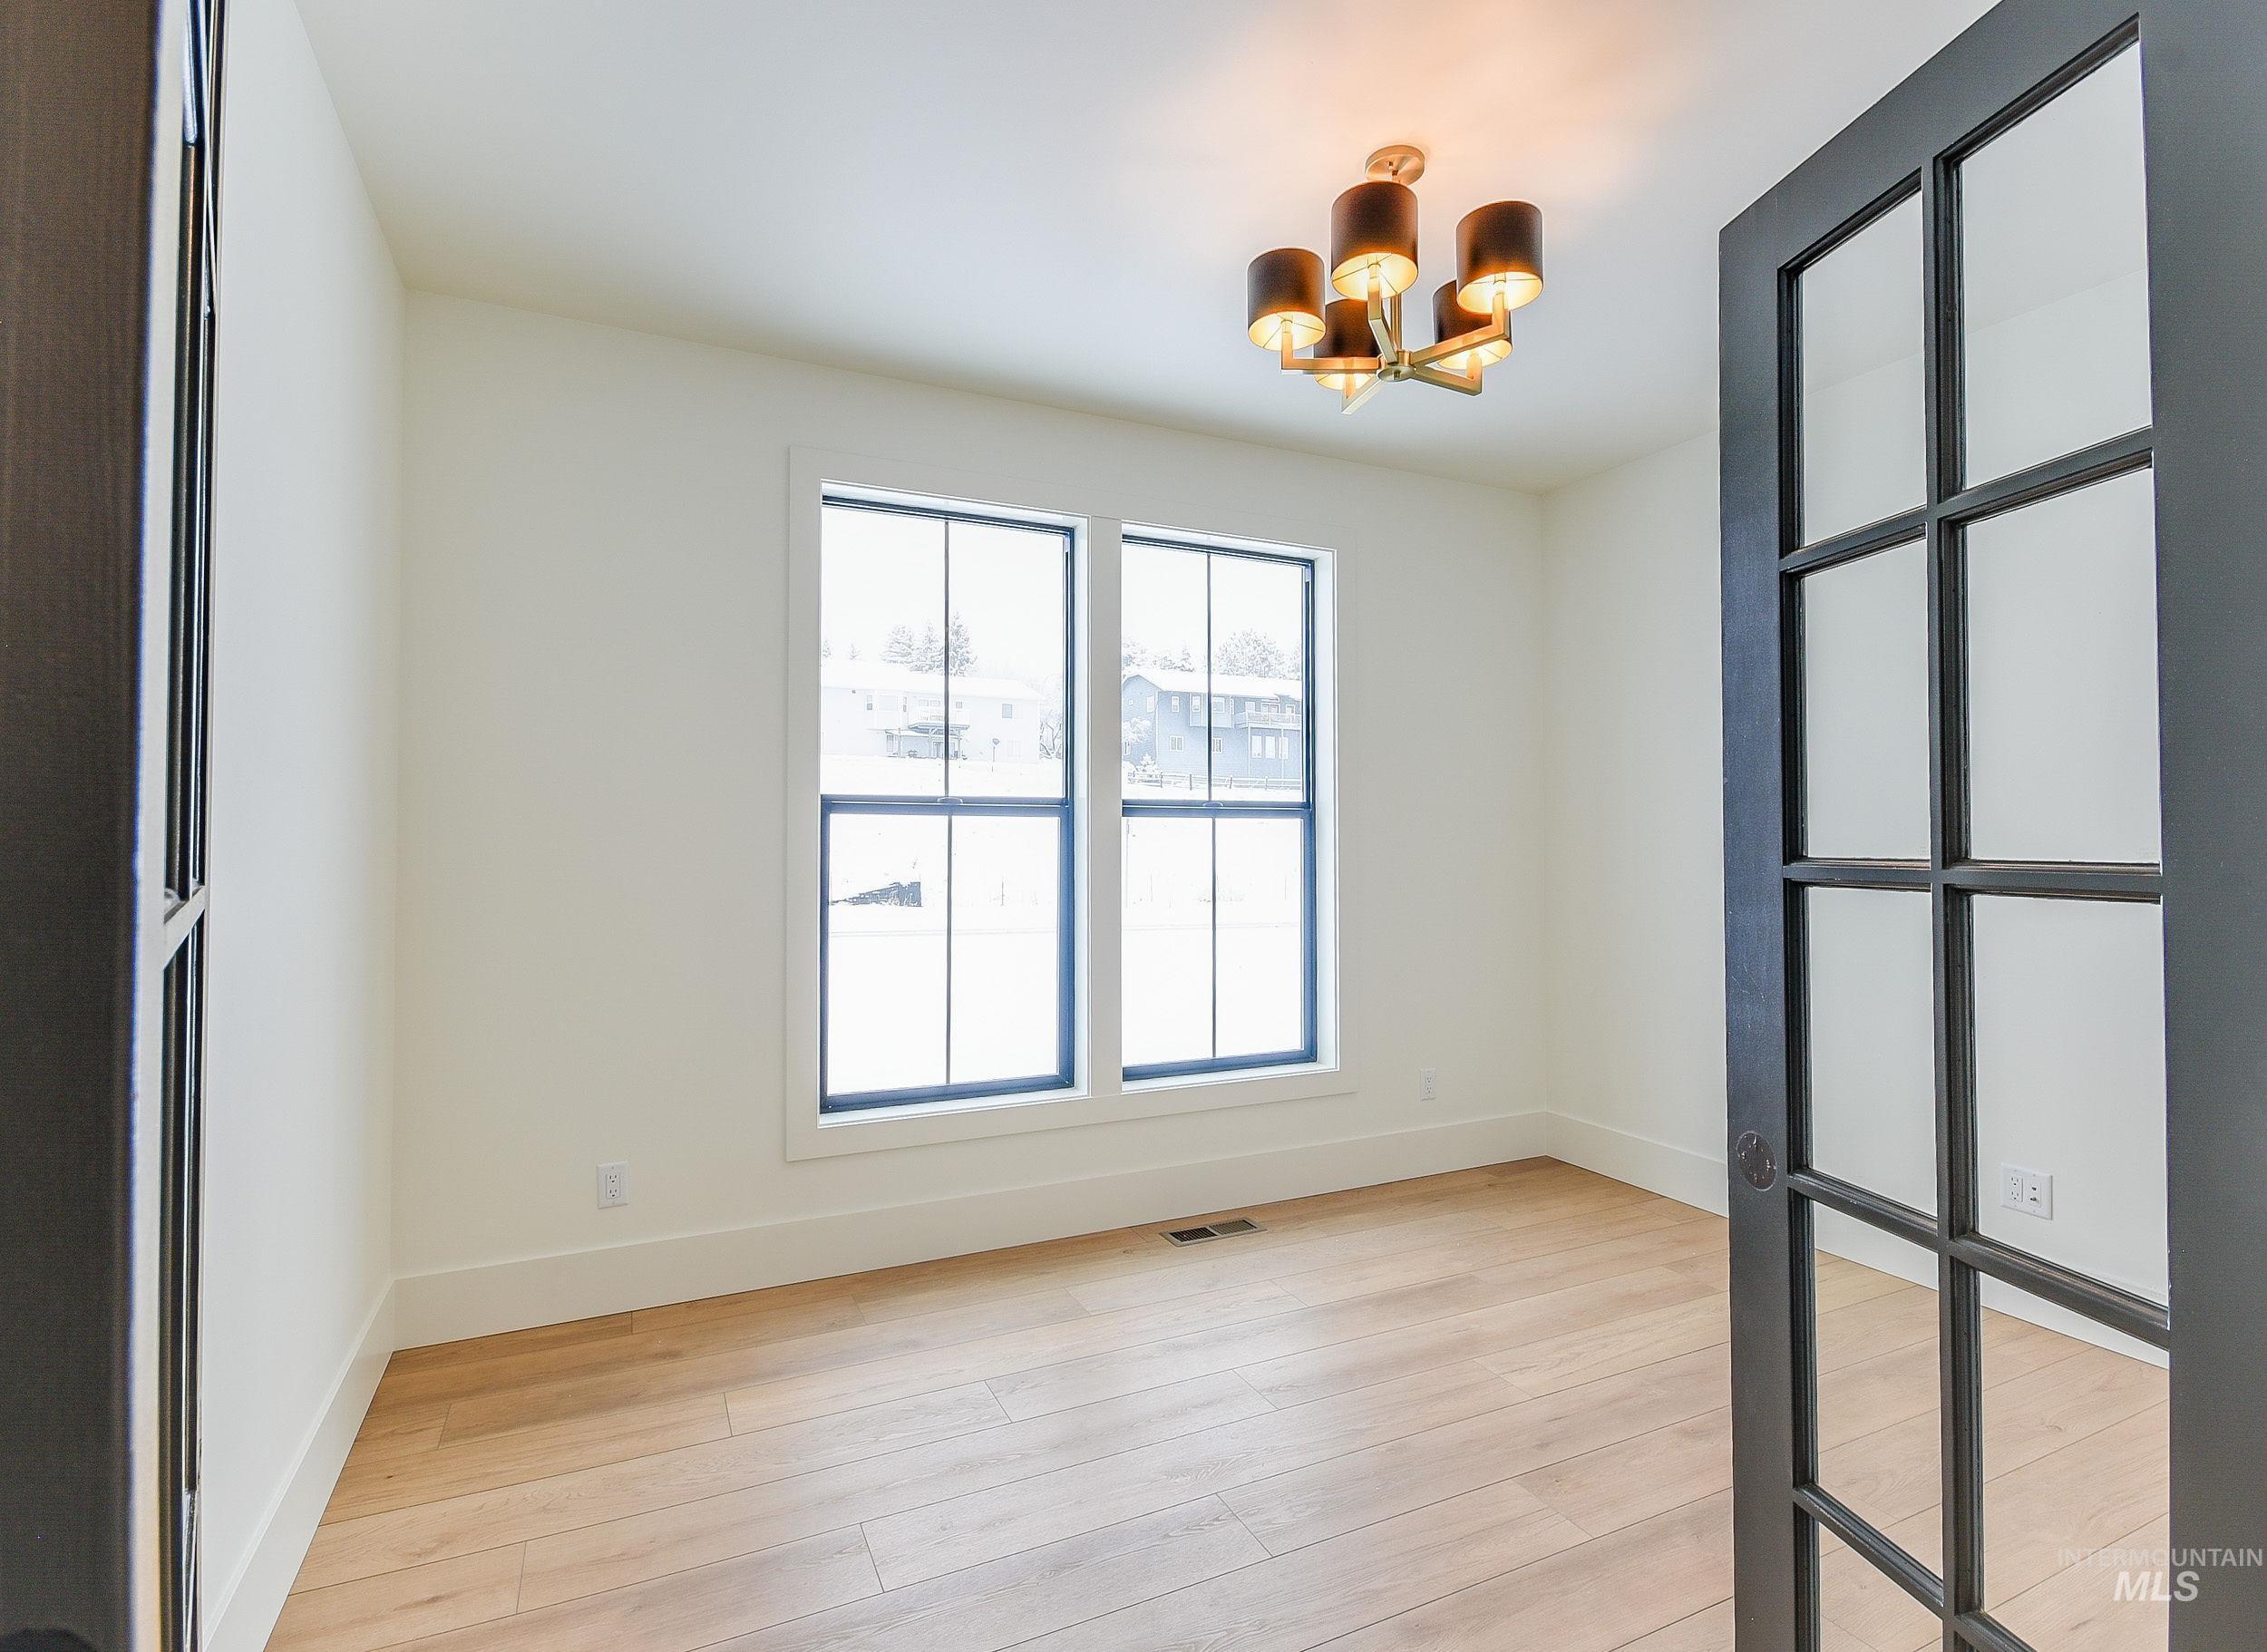 439 Southview Property Photo 34